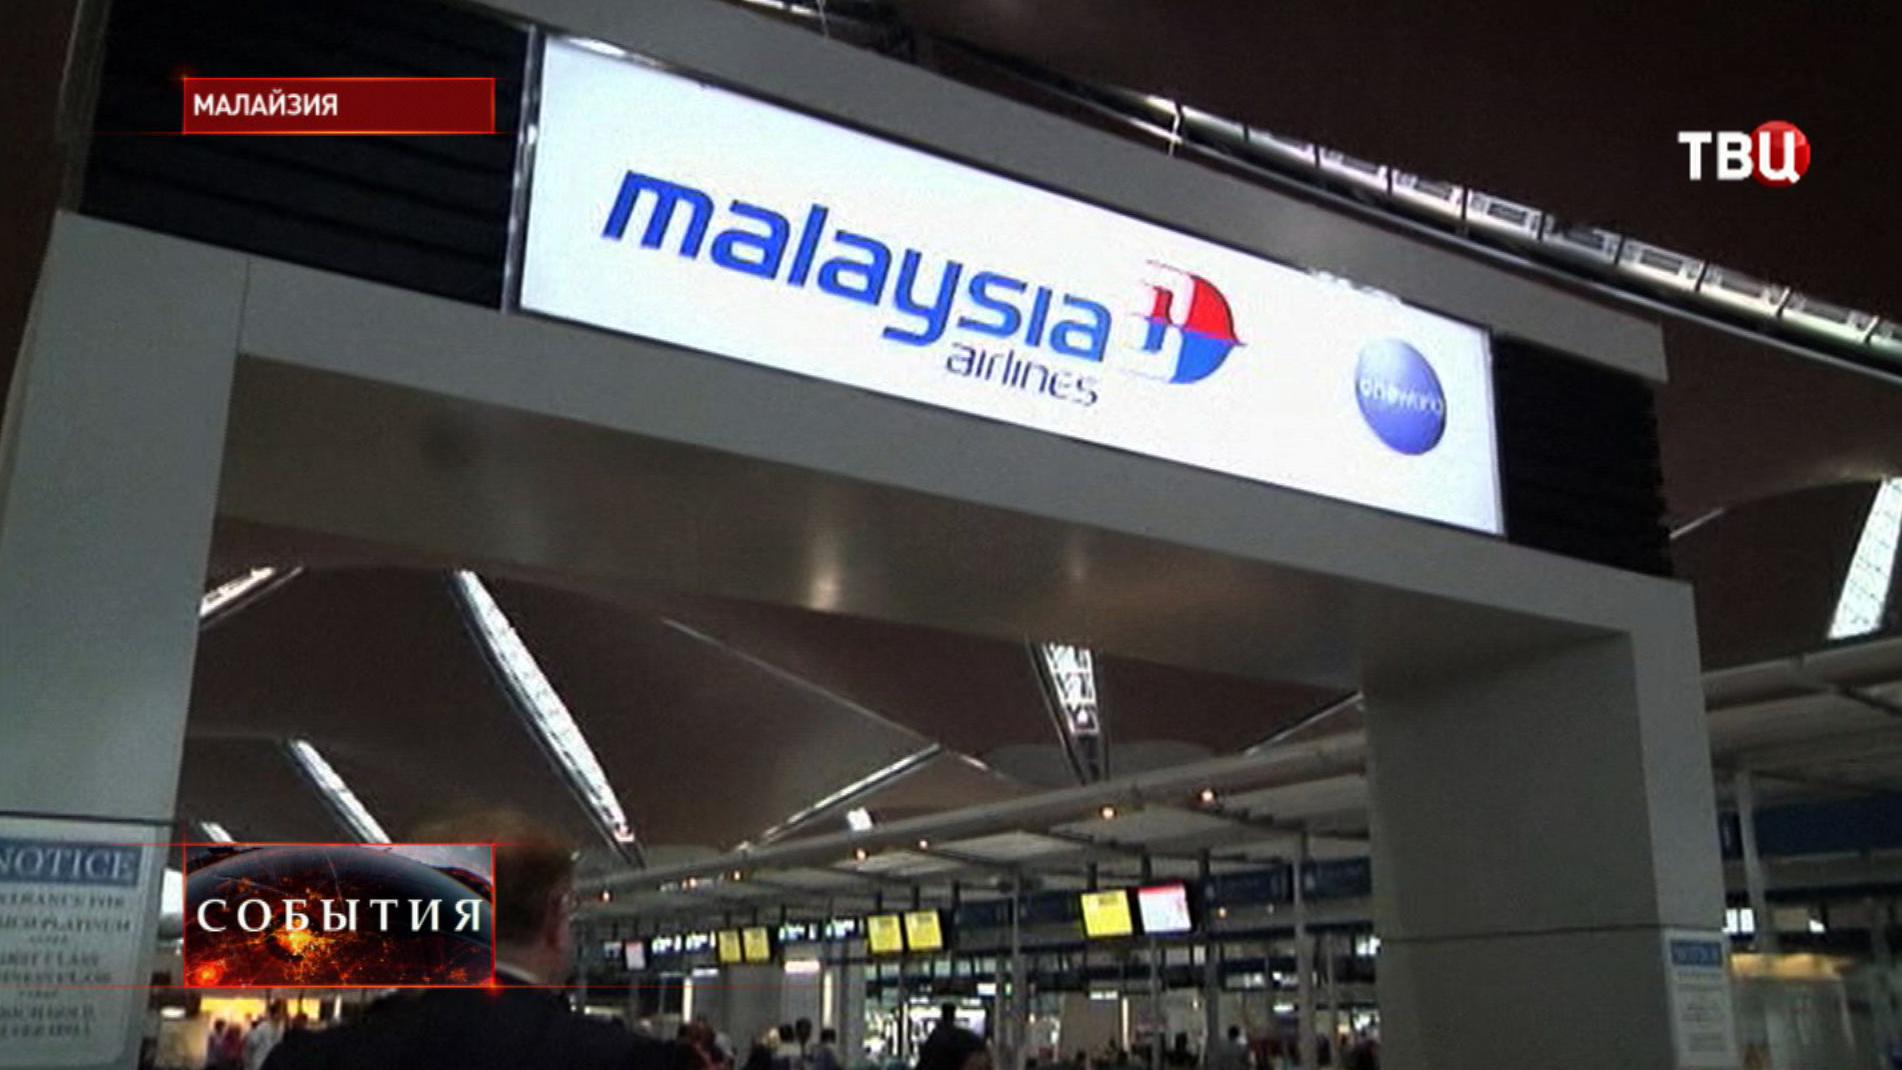 Аэропорт в Малайзии